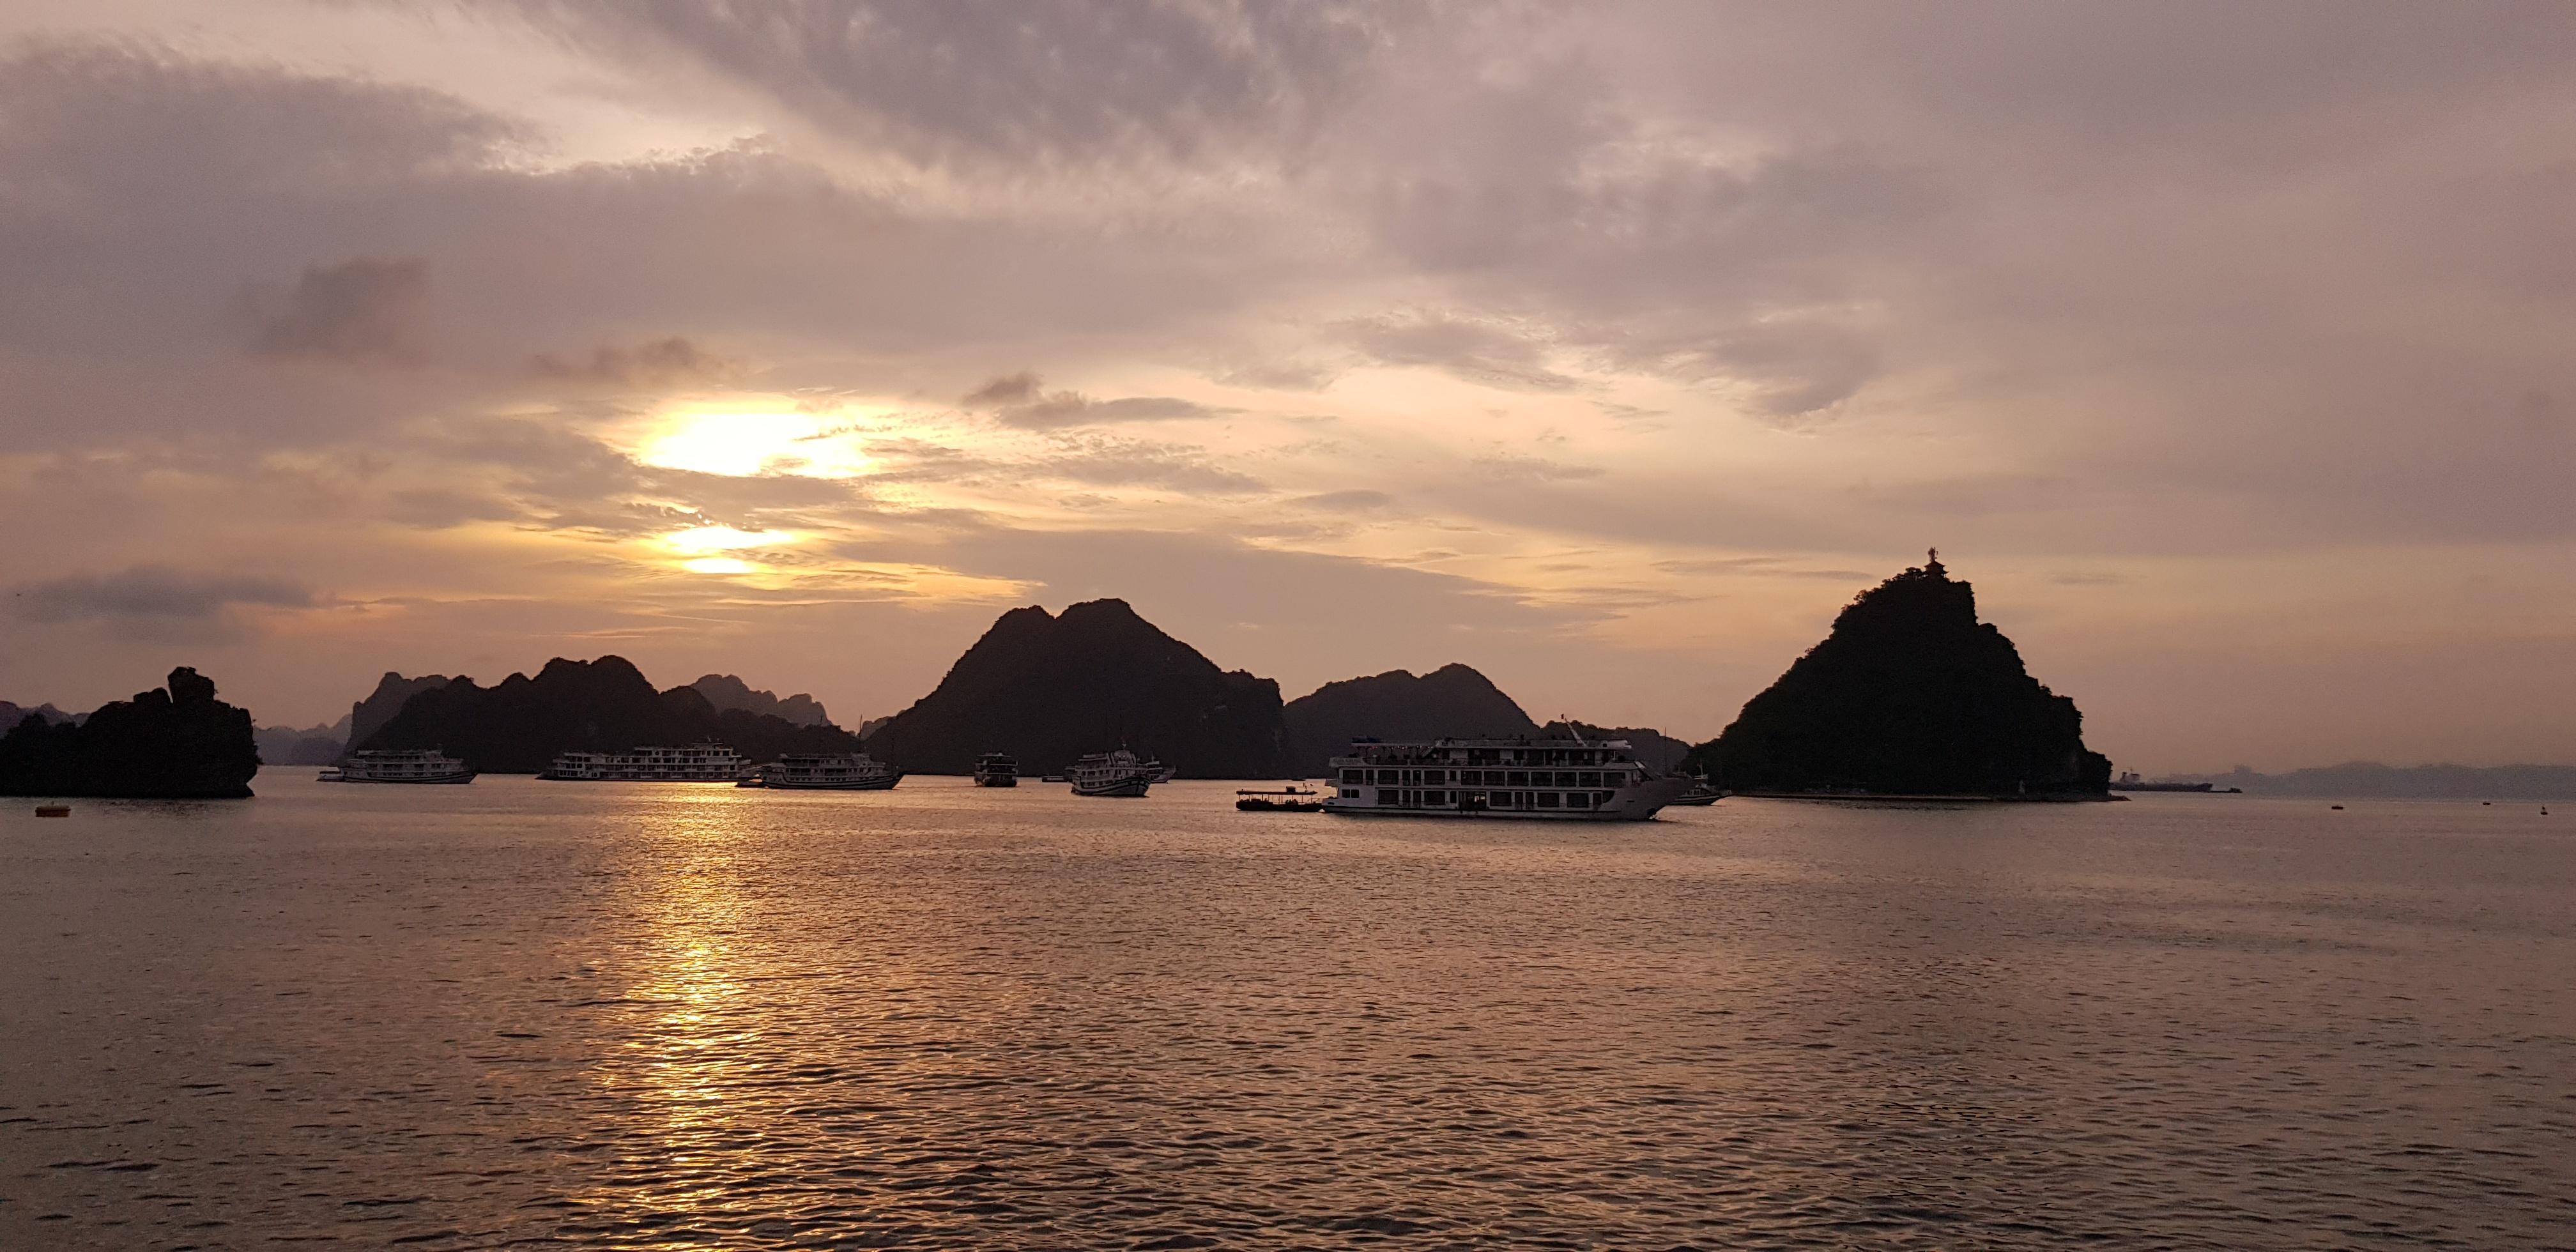 The sun setting over Ha Long Bay.